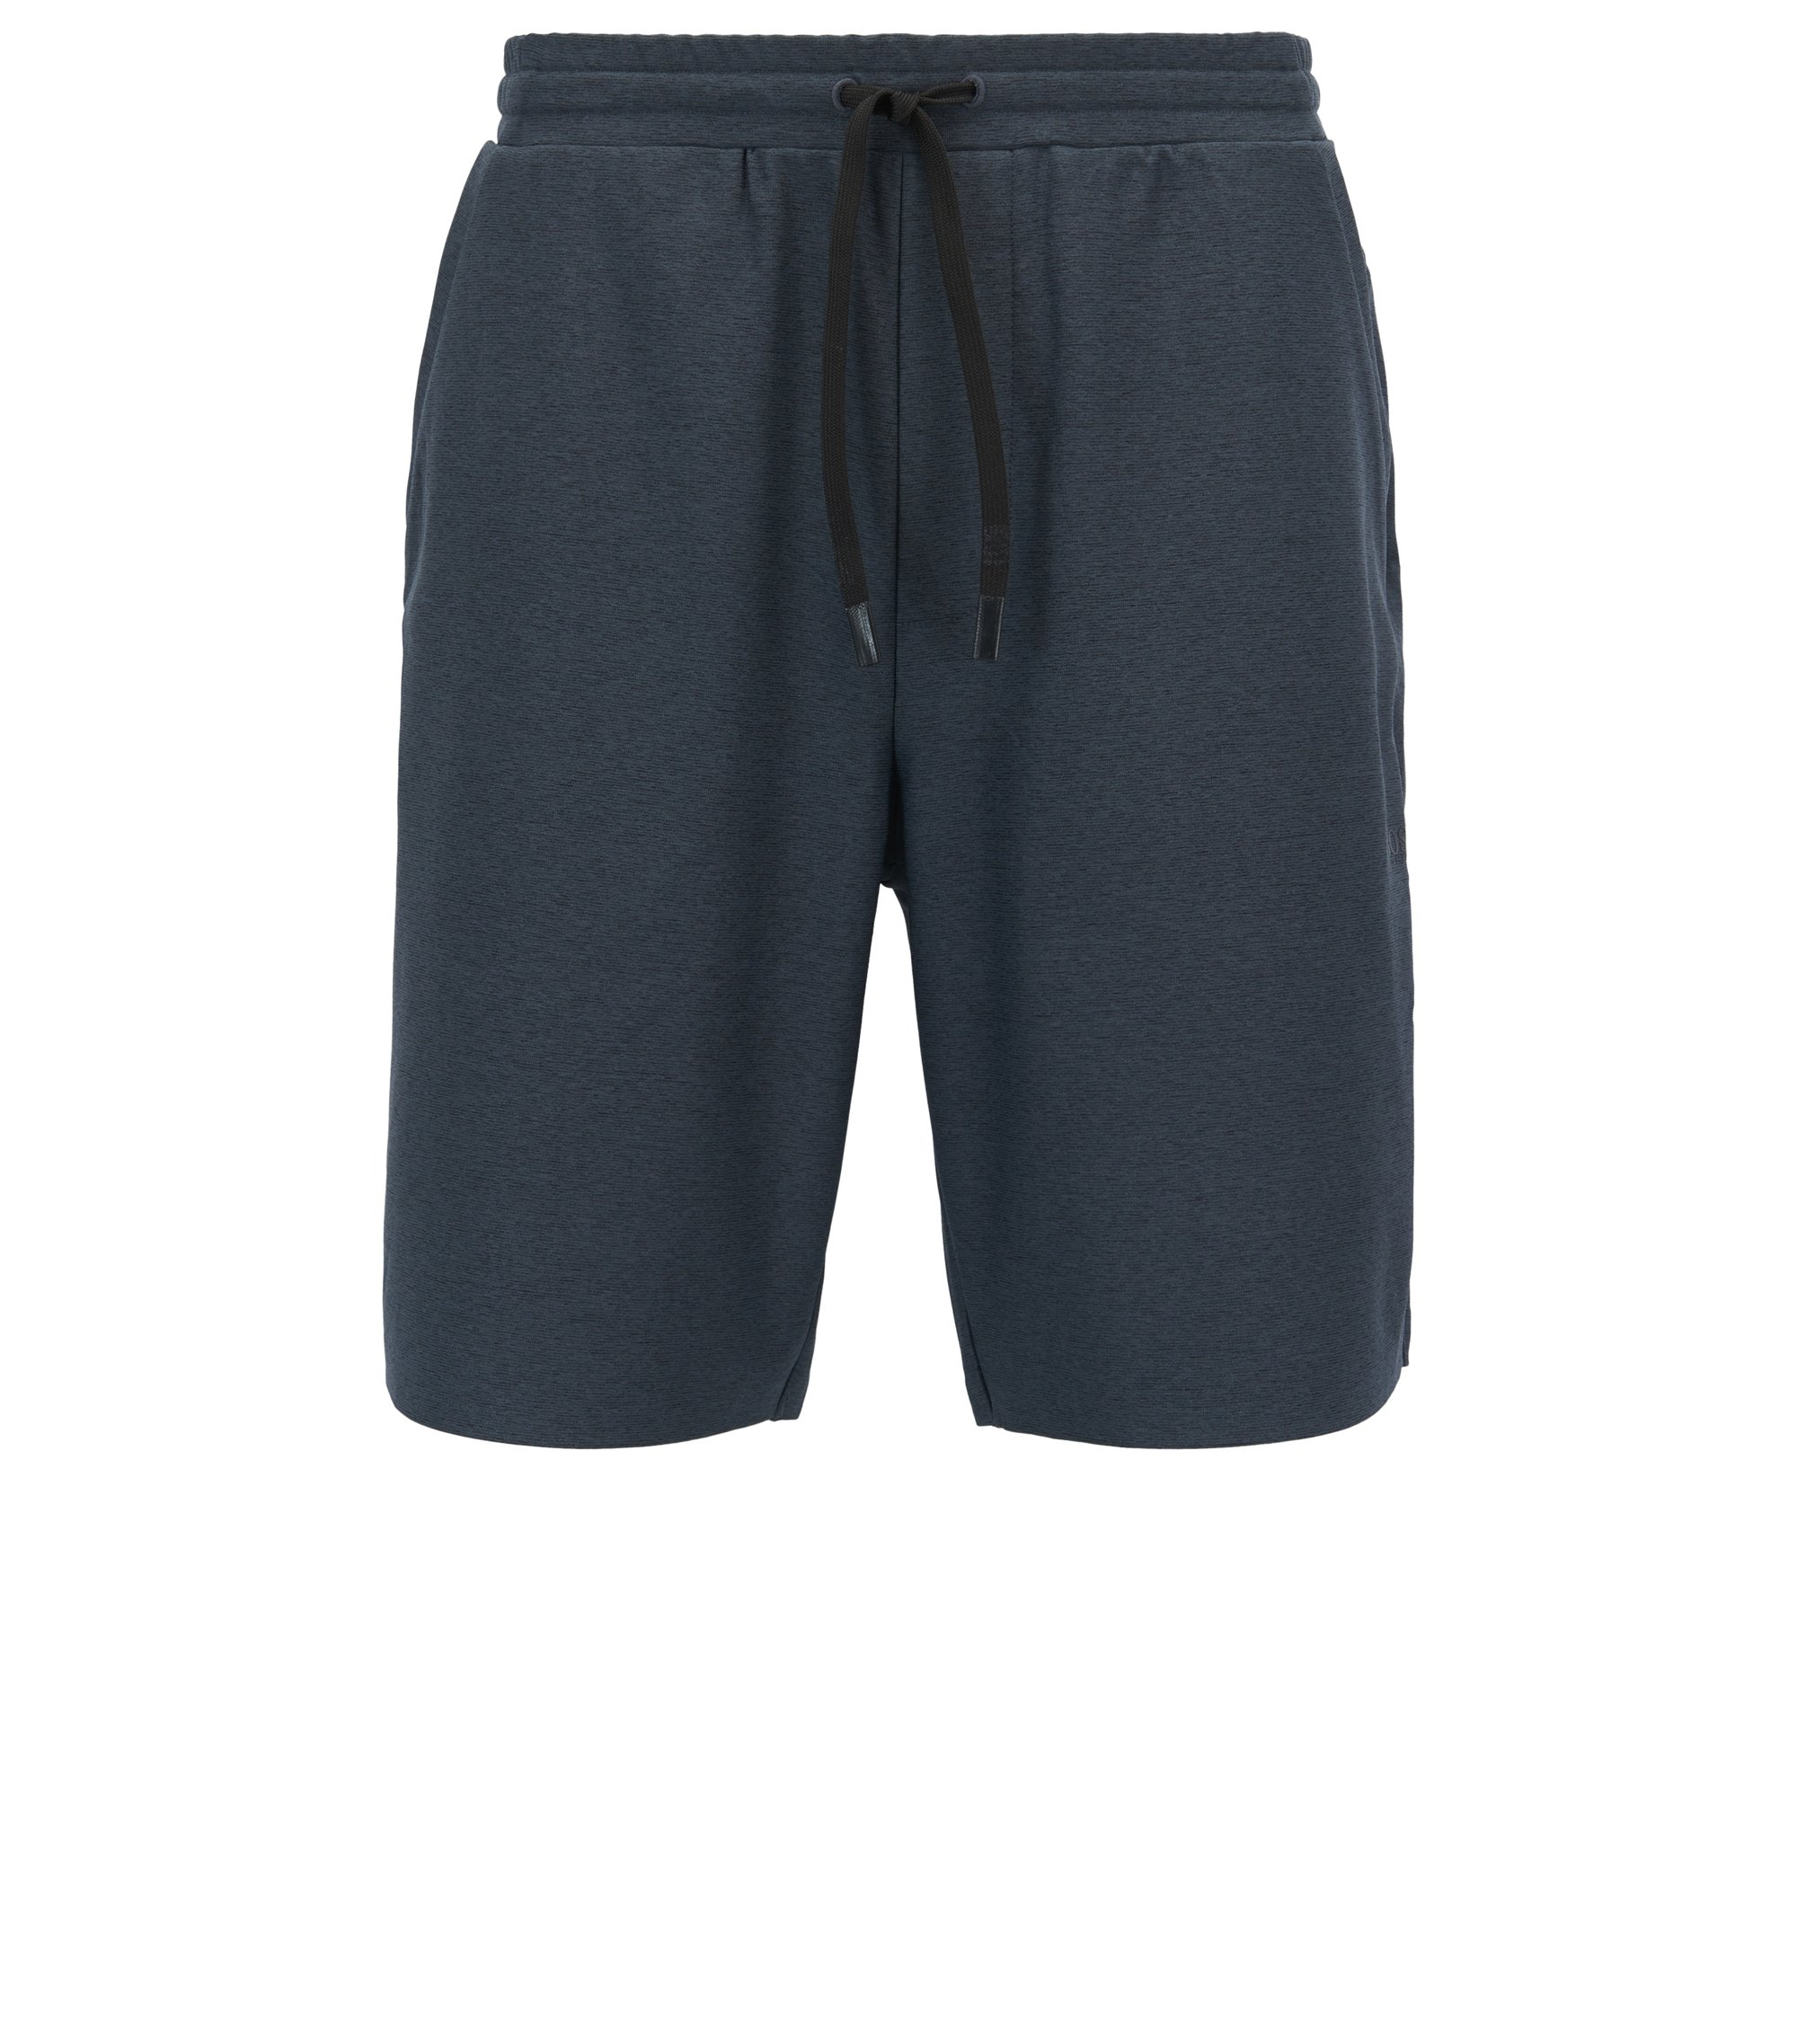 Stretch Jersey Short | Headlo, Black